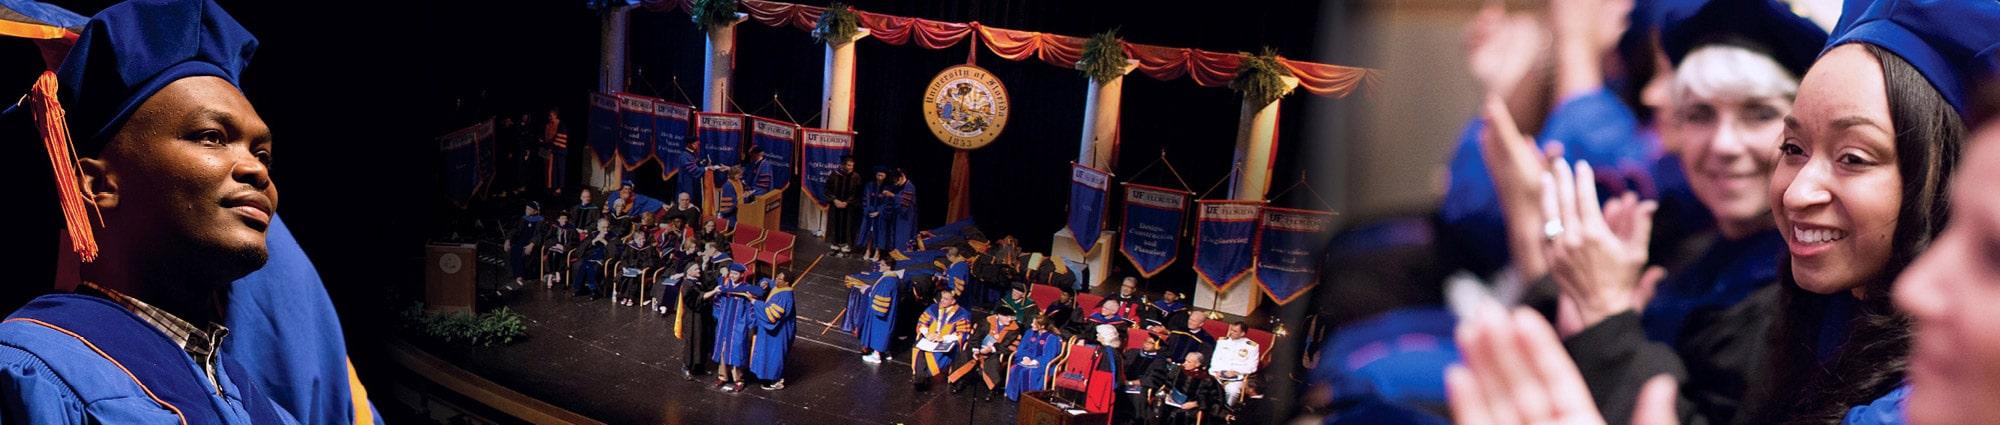 Doctoral graduation